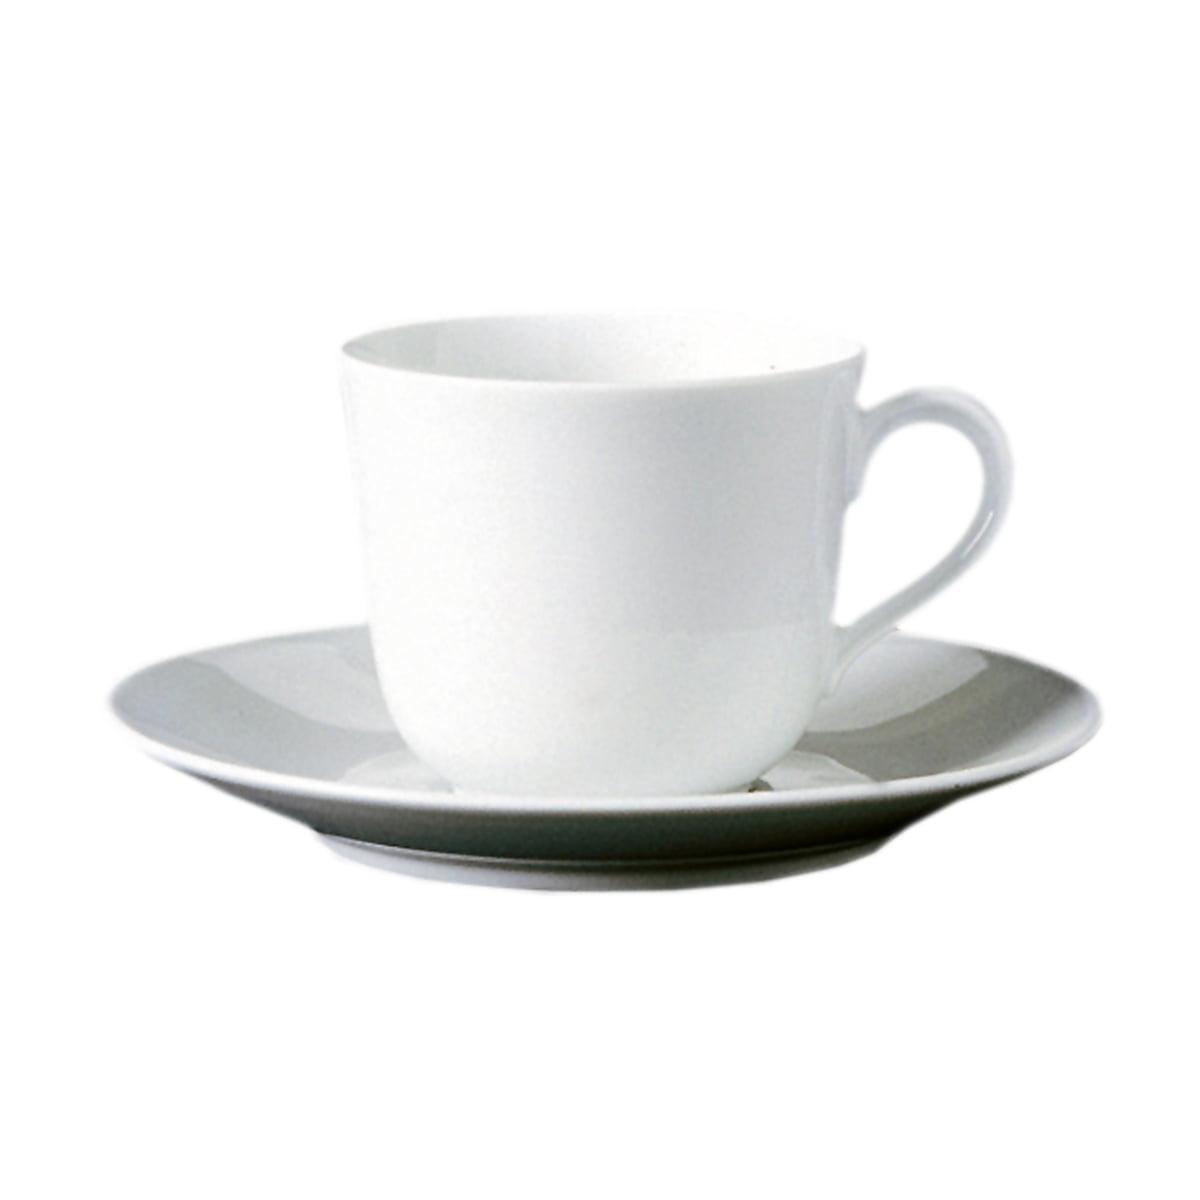 Wagenfeld - Kaffeetasse 2-tlg., weiß